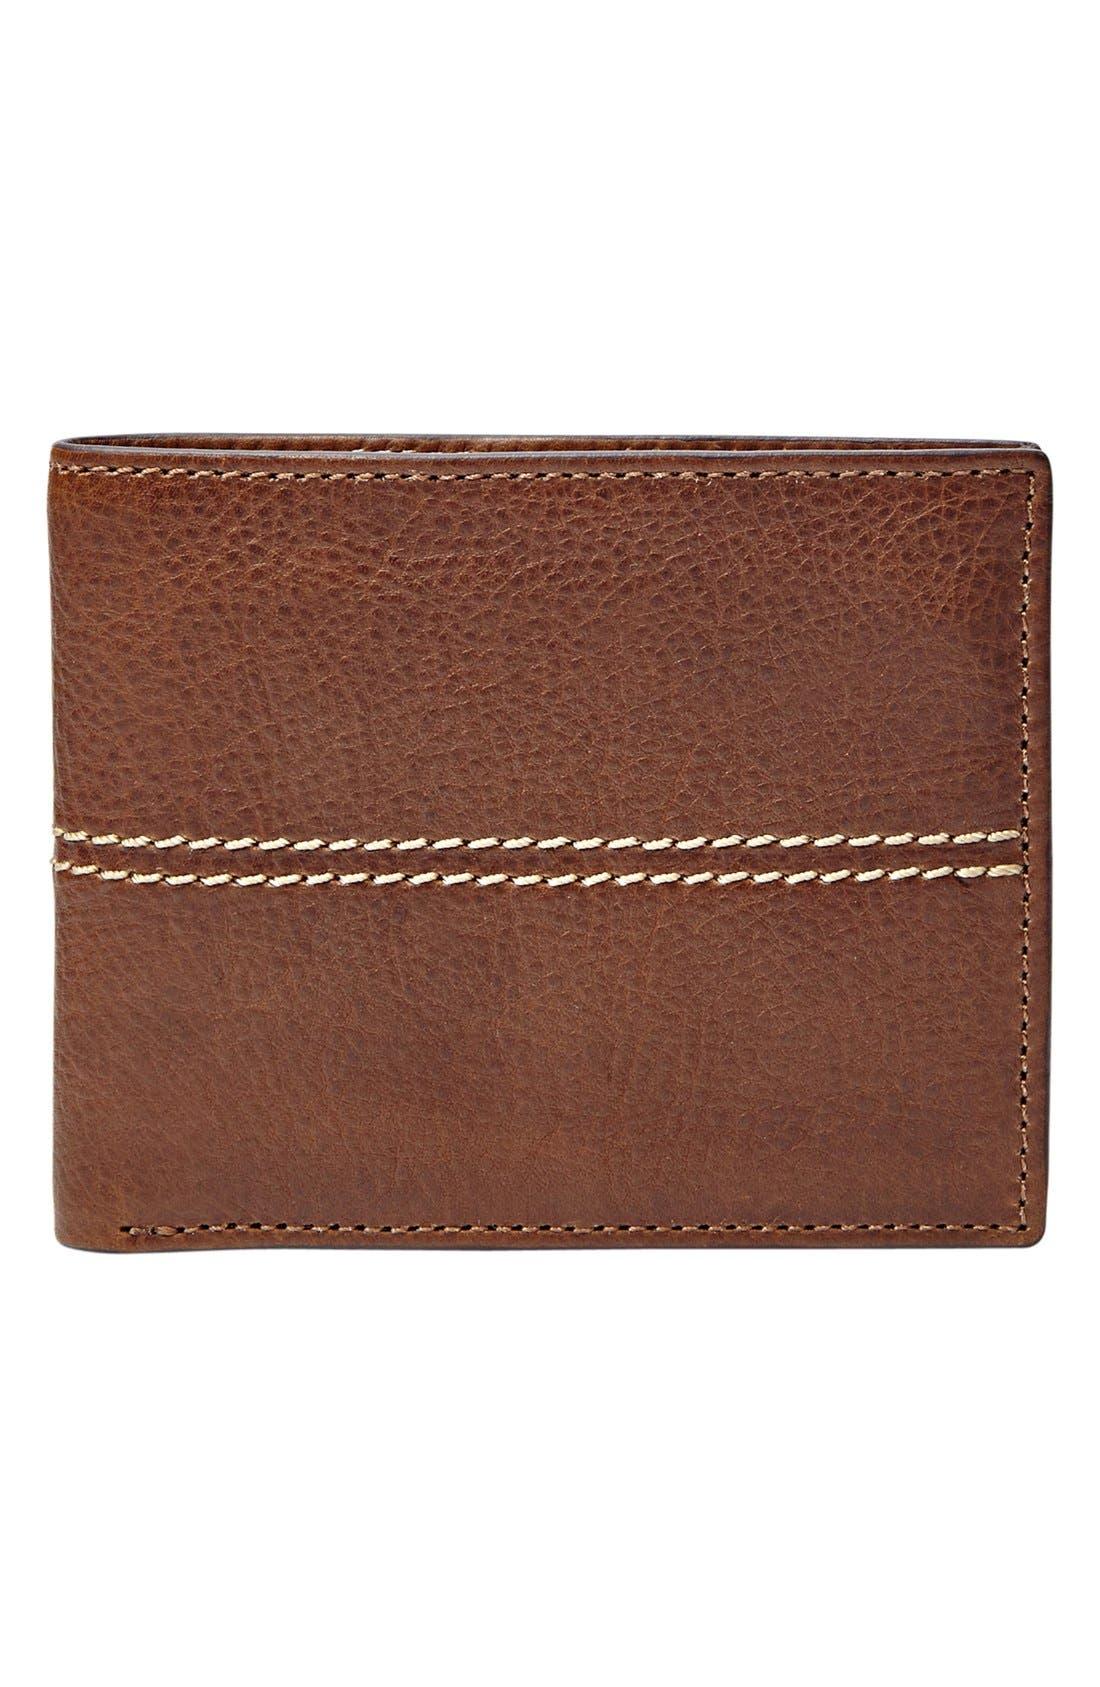 Fossil 'Turk' Leather RFID Wallet